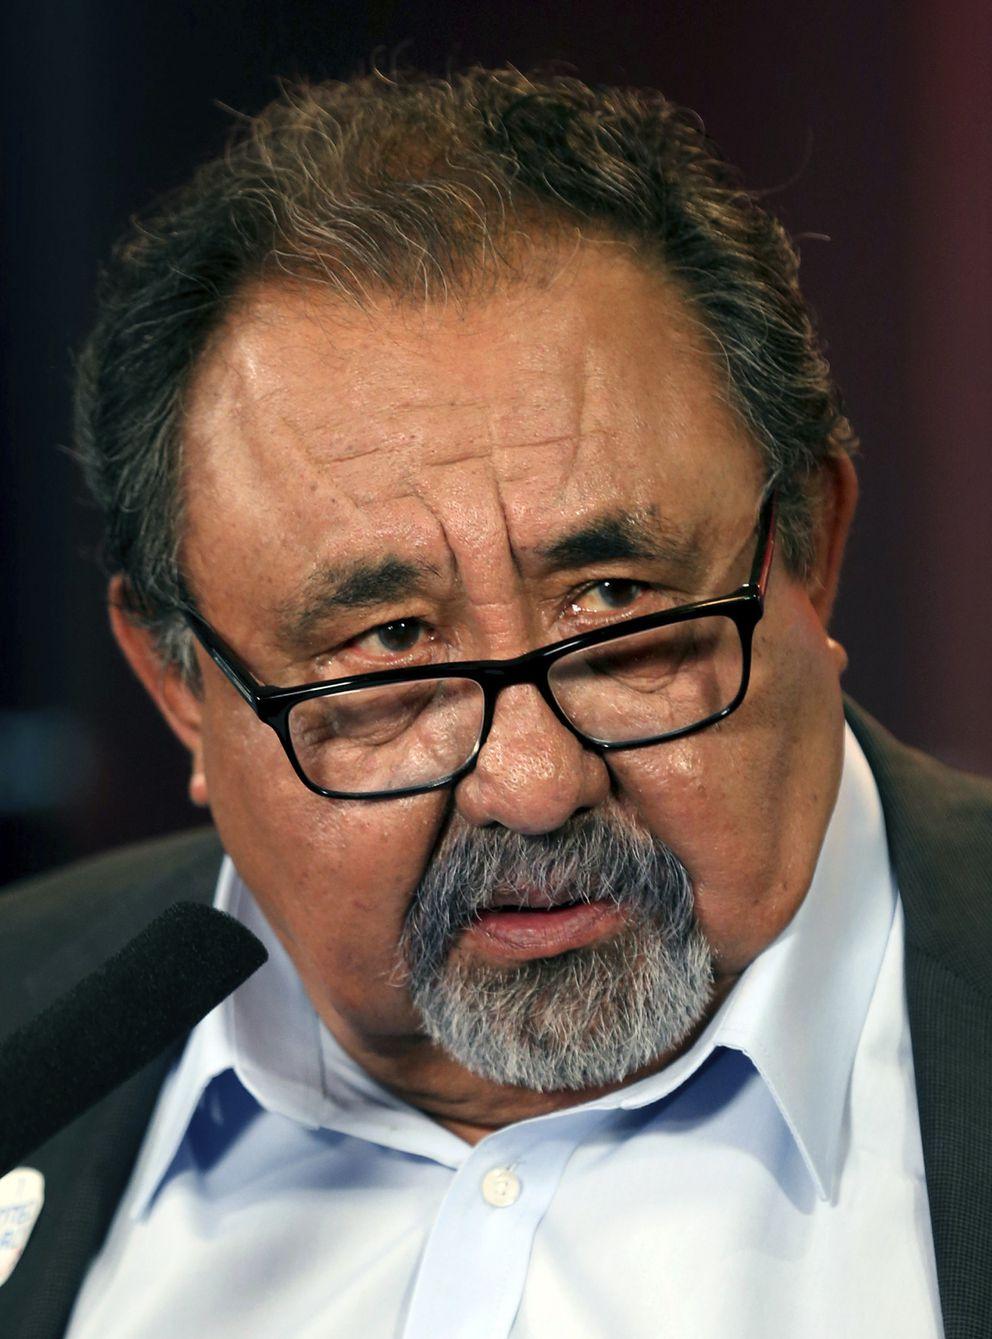 This Oct. 17, 2018 file photo shows U.S. Rep. Raul Grijalva, D-Ariz. (Kelly Presnell/Arizona Daily Star via AP, File)